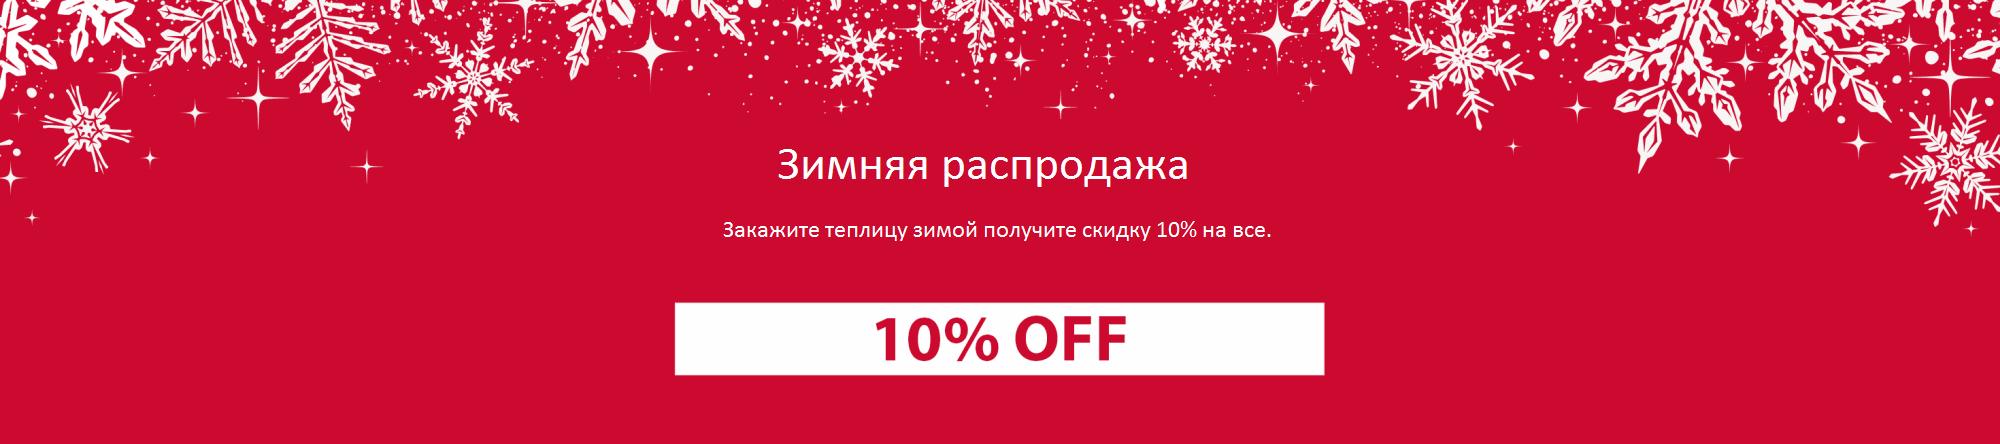 GreenHouseShop_sale 10% - копия